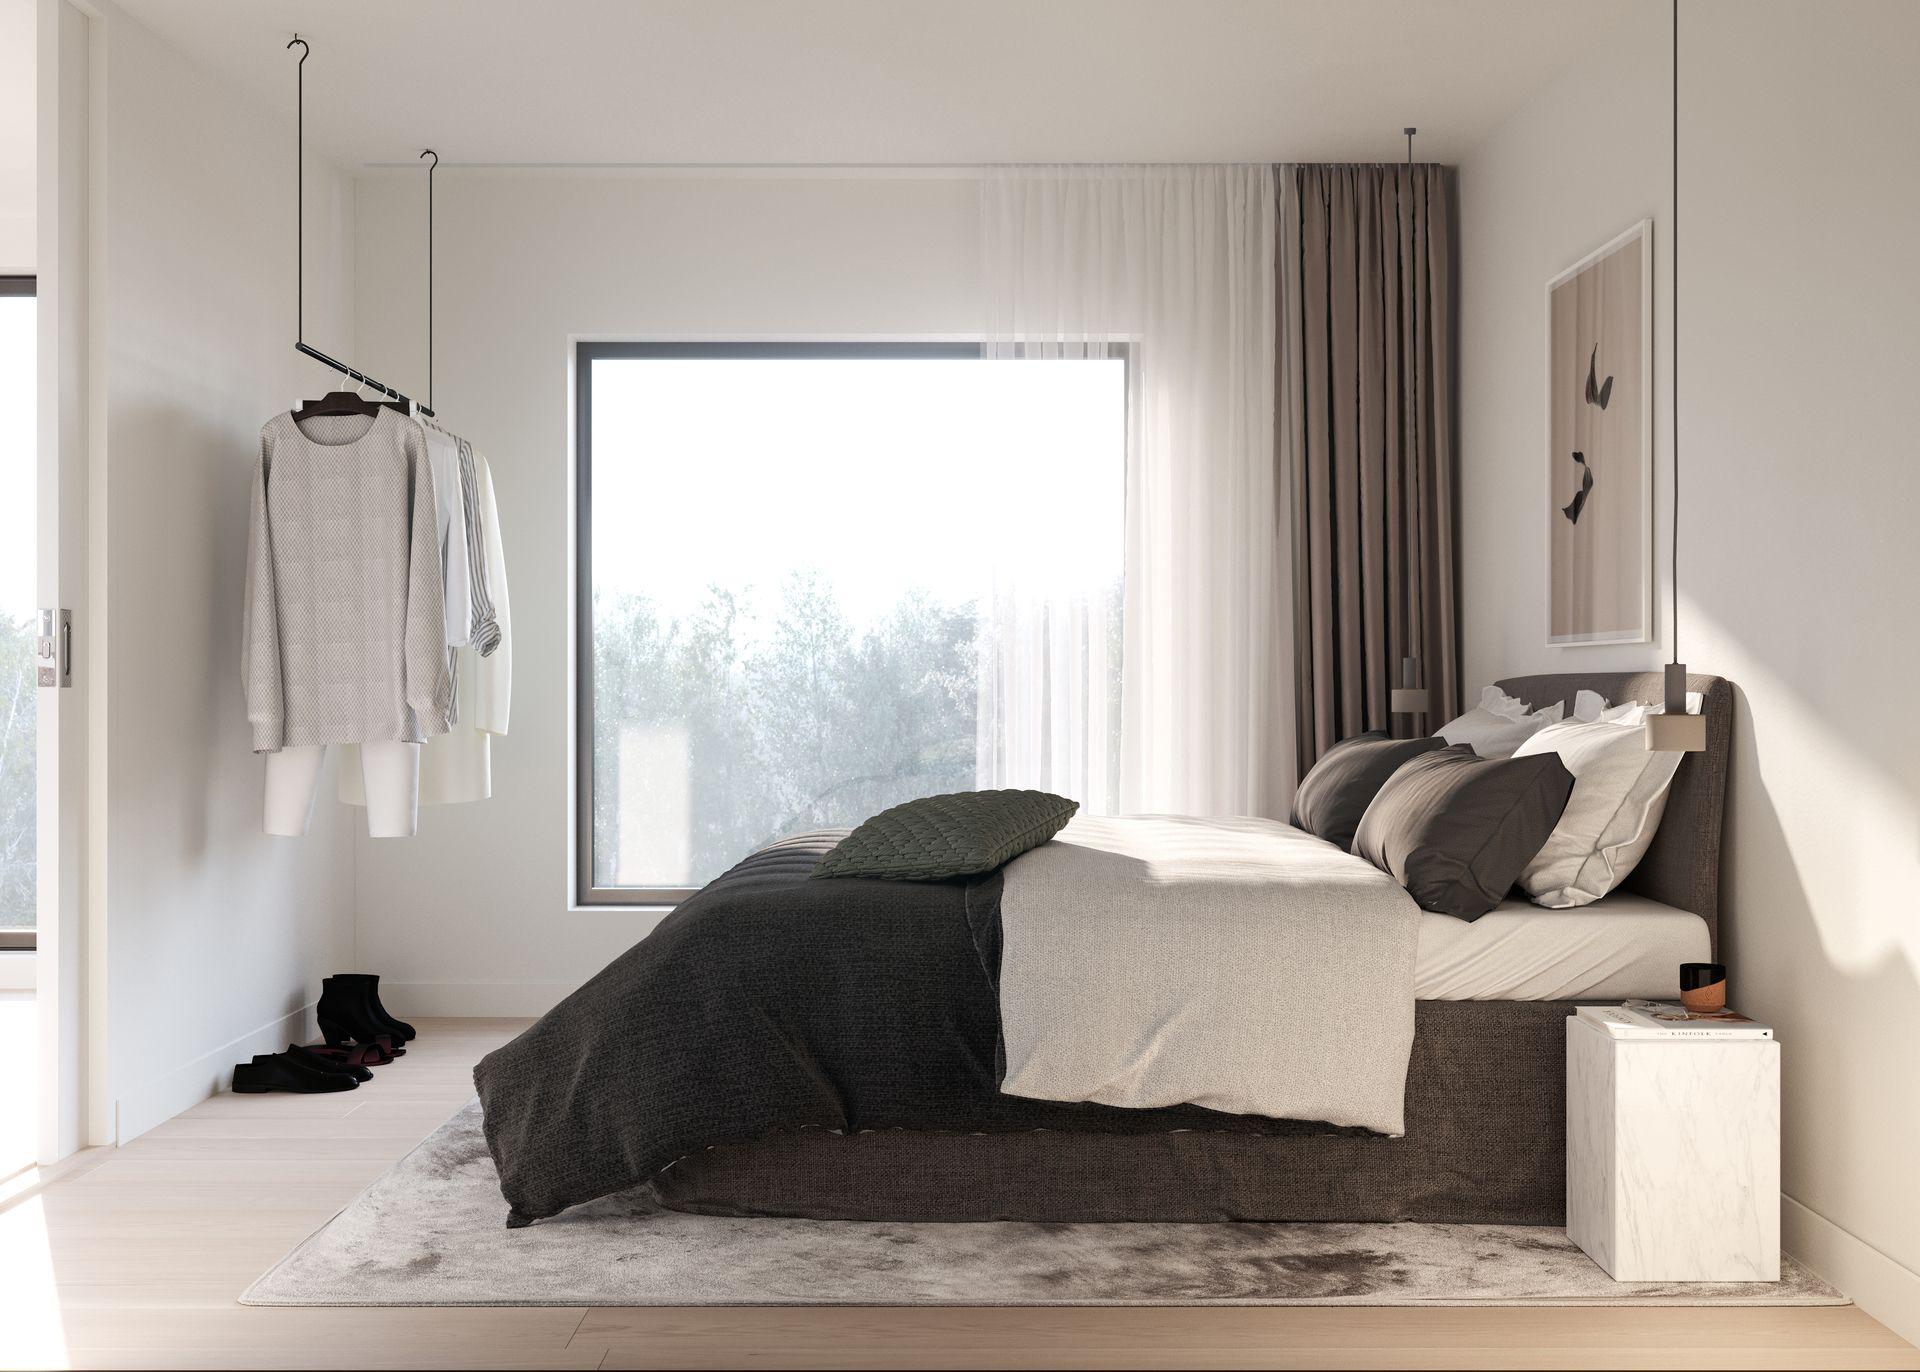 Alexander White Scandinavian style furniture, Nordic